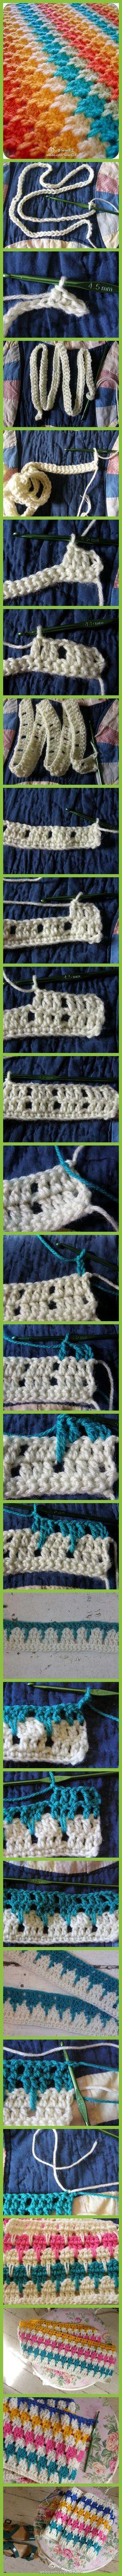 Nice stitch photo tutorial